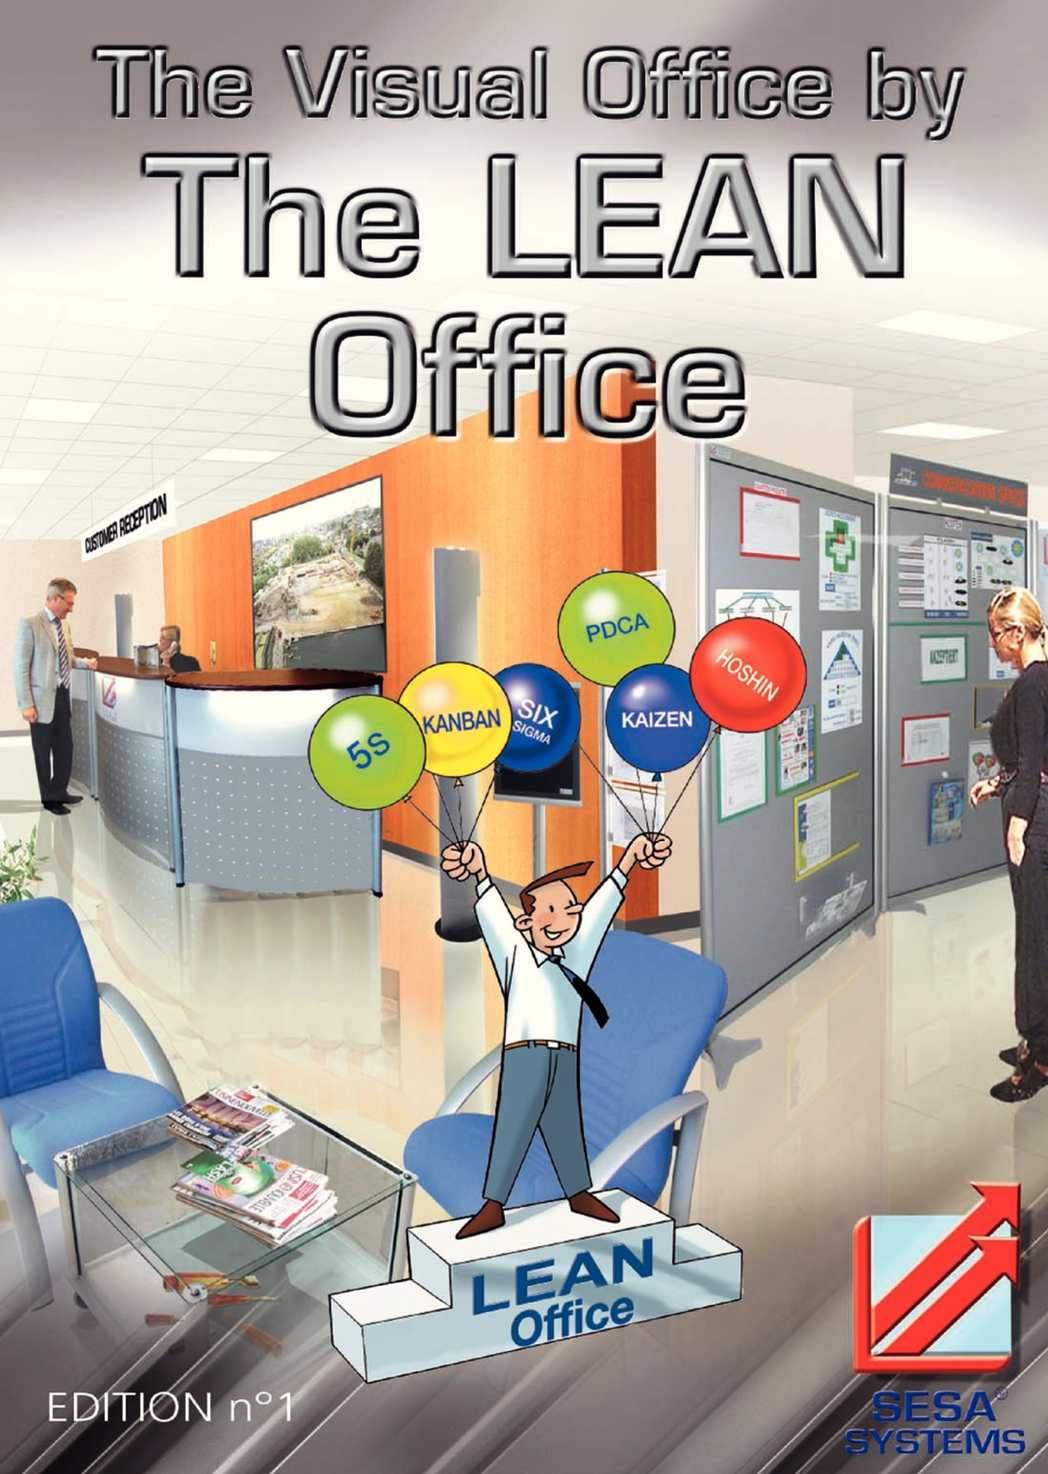 Customer Experience Management >> Calaméo - Sesa Systems - Lean Office